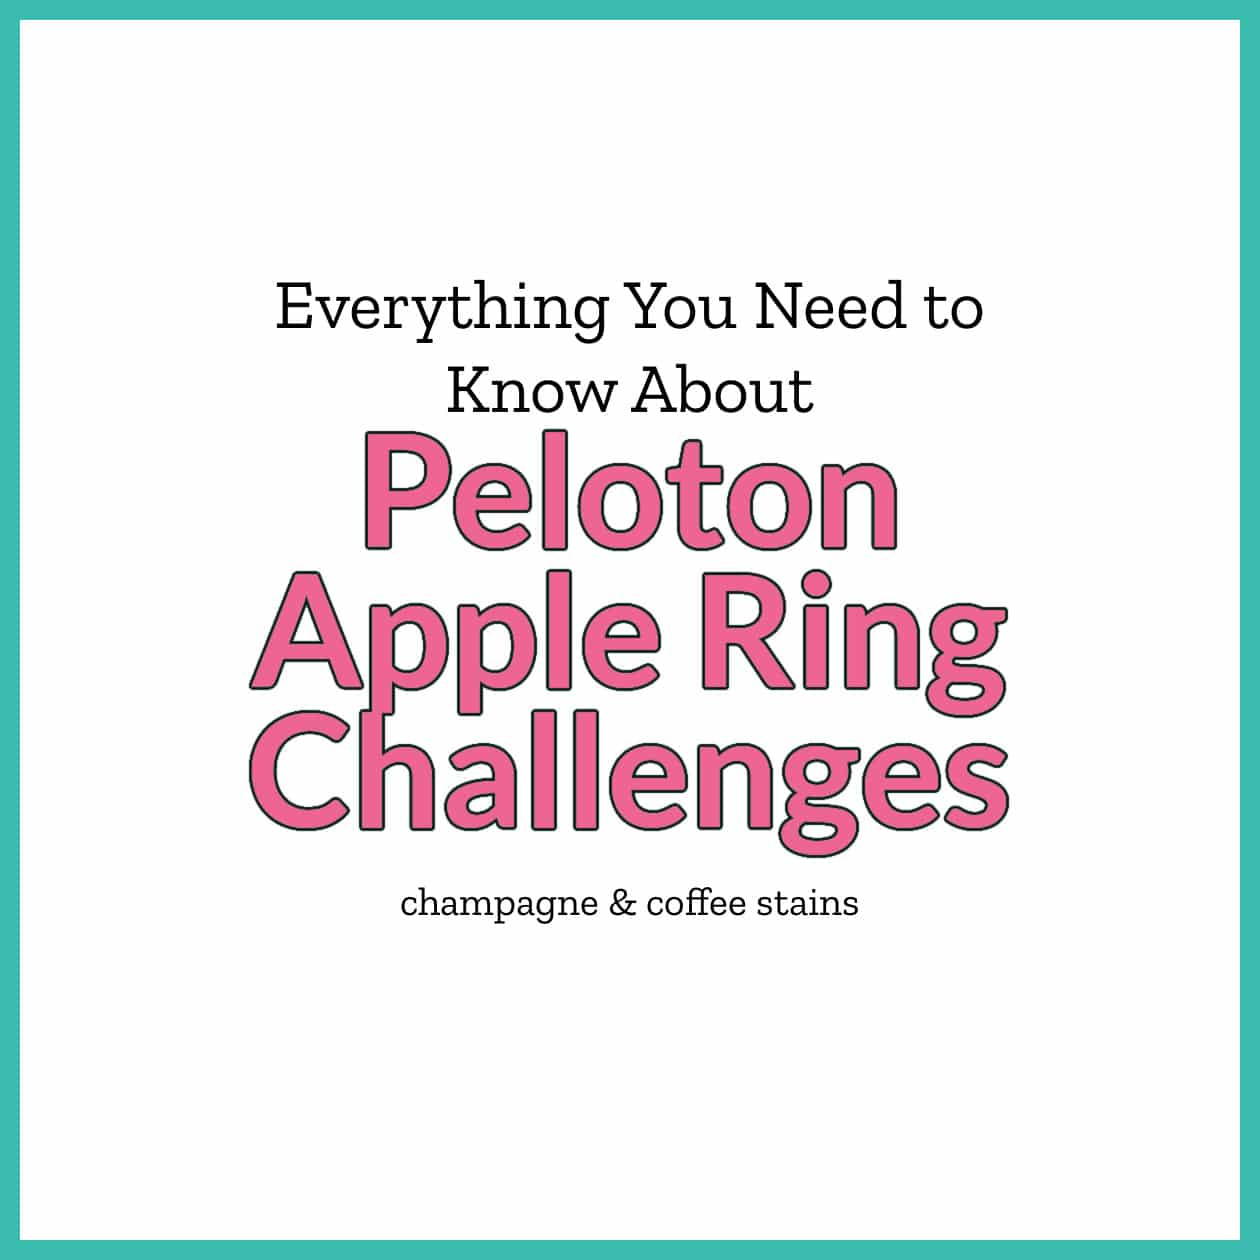 peloton apple ring challenges